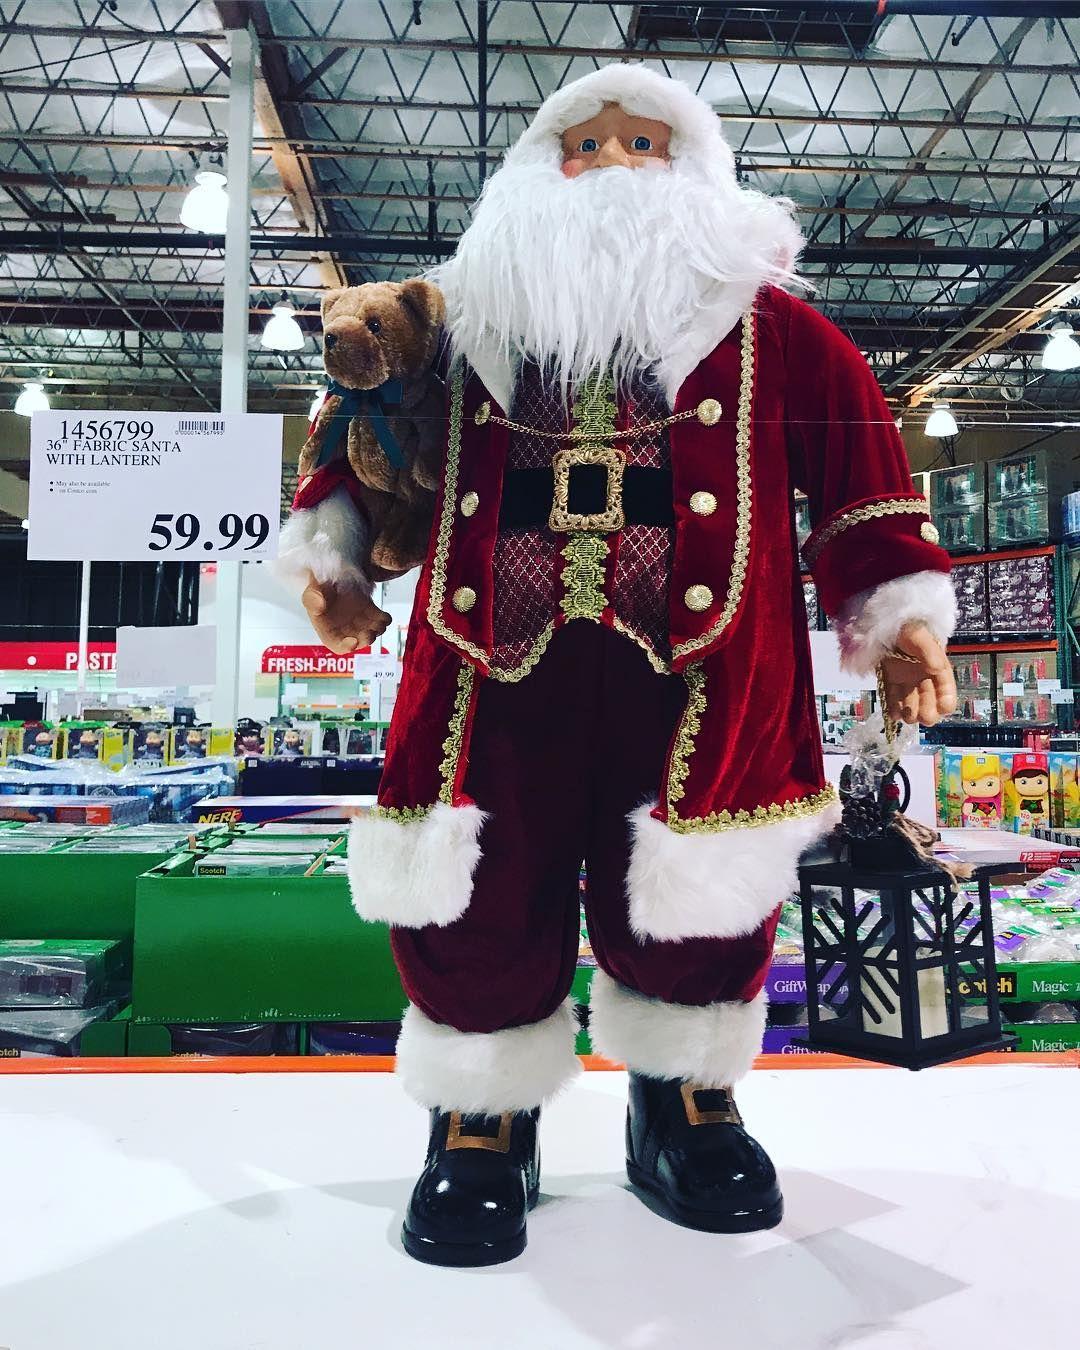 "36"" Fabric #santaclaus With #lantern $59.99 #christmas"